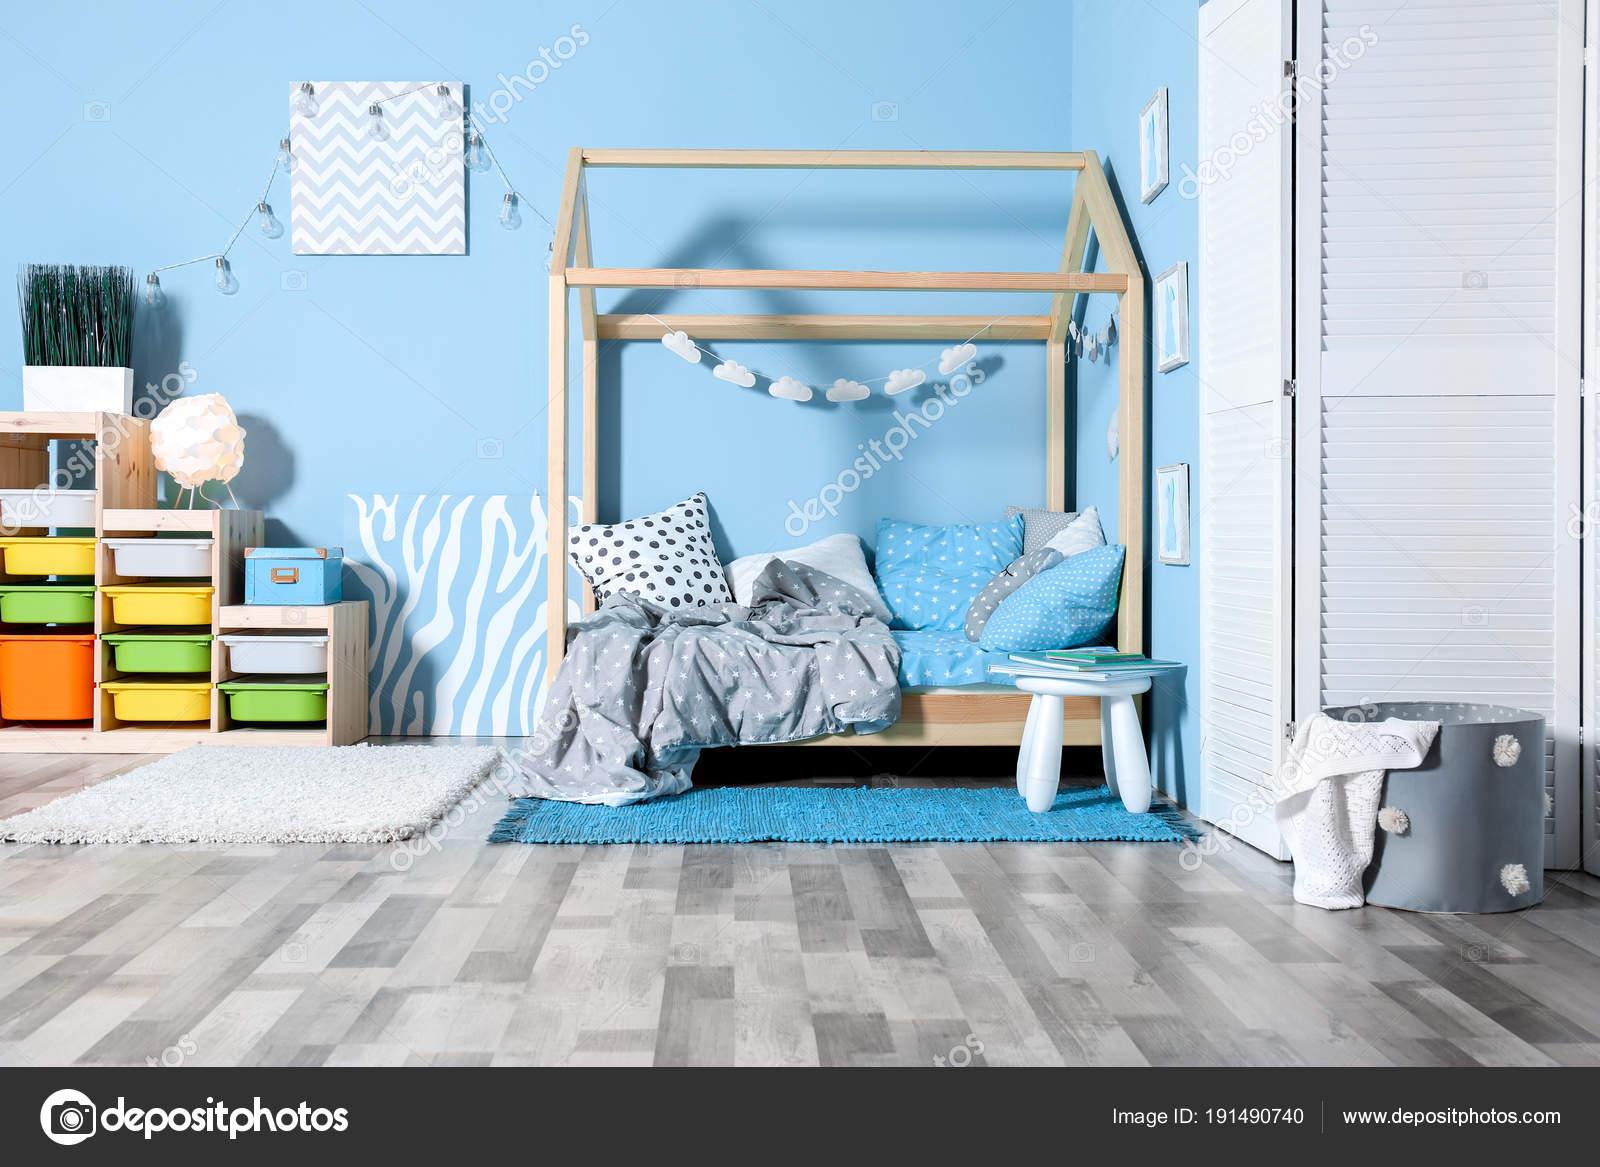 Comfortabel bed in moderne kinderkamer u2014 stockfoto